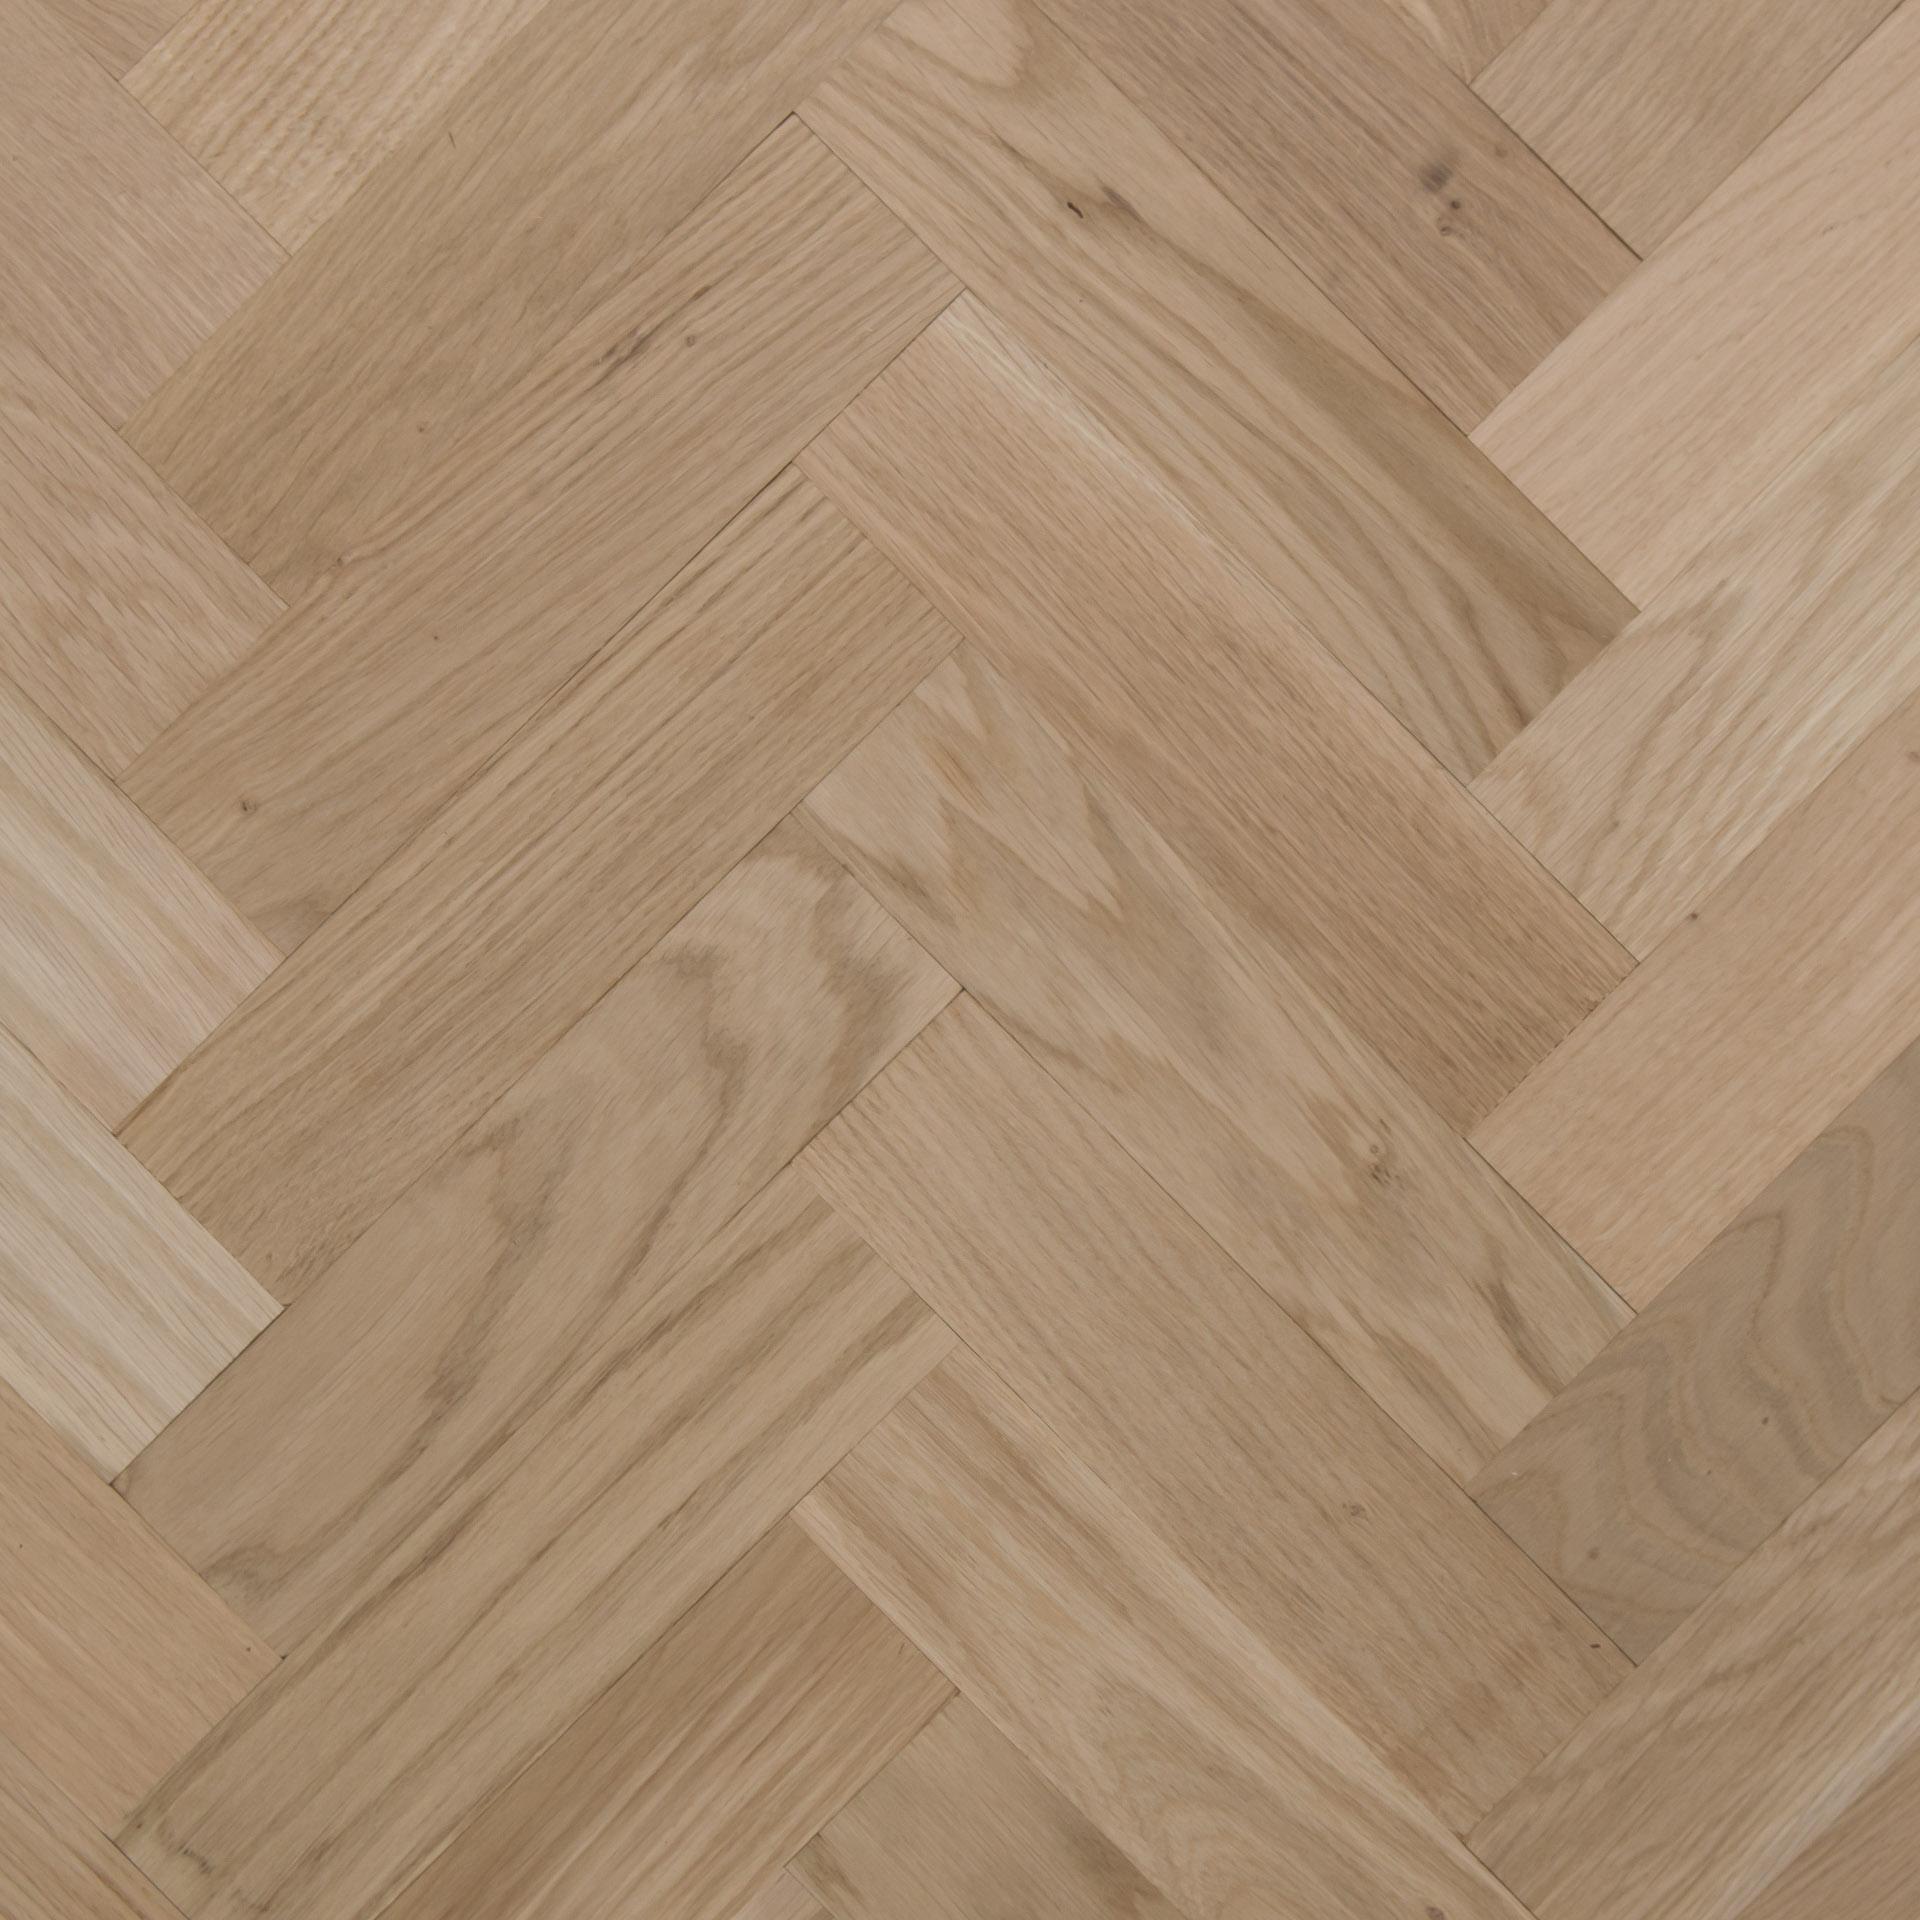 herringbone 250mm x 62mm x 10mm volks flooring. Black Bedroom Furniture Sets. Home Design Ideas